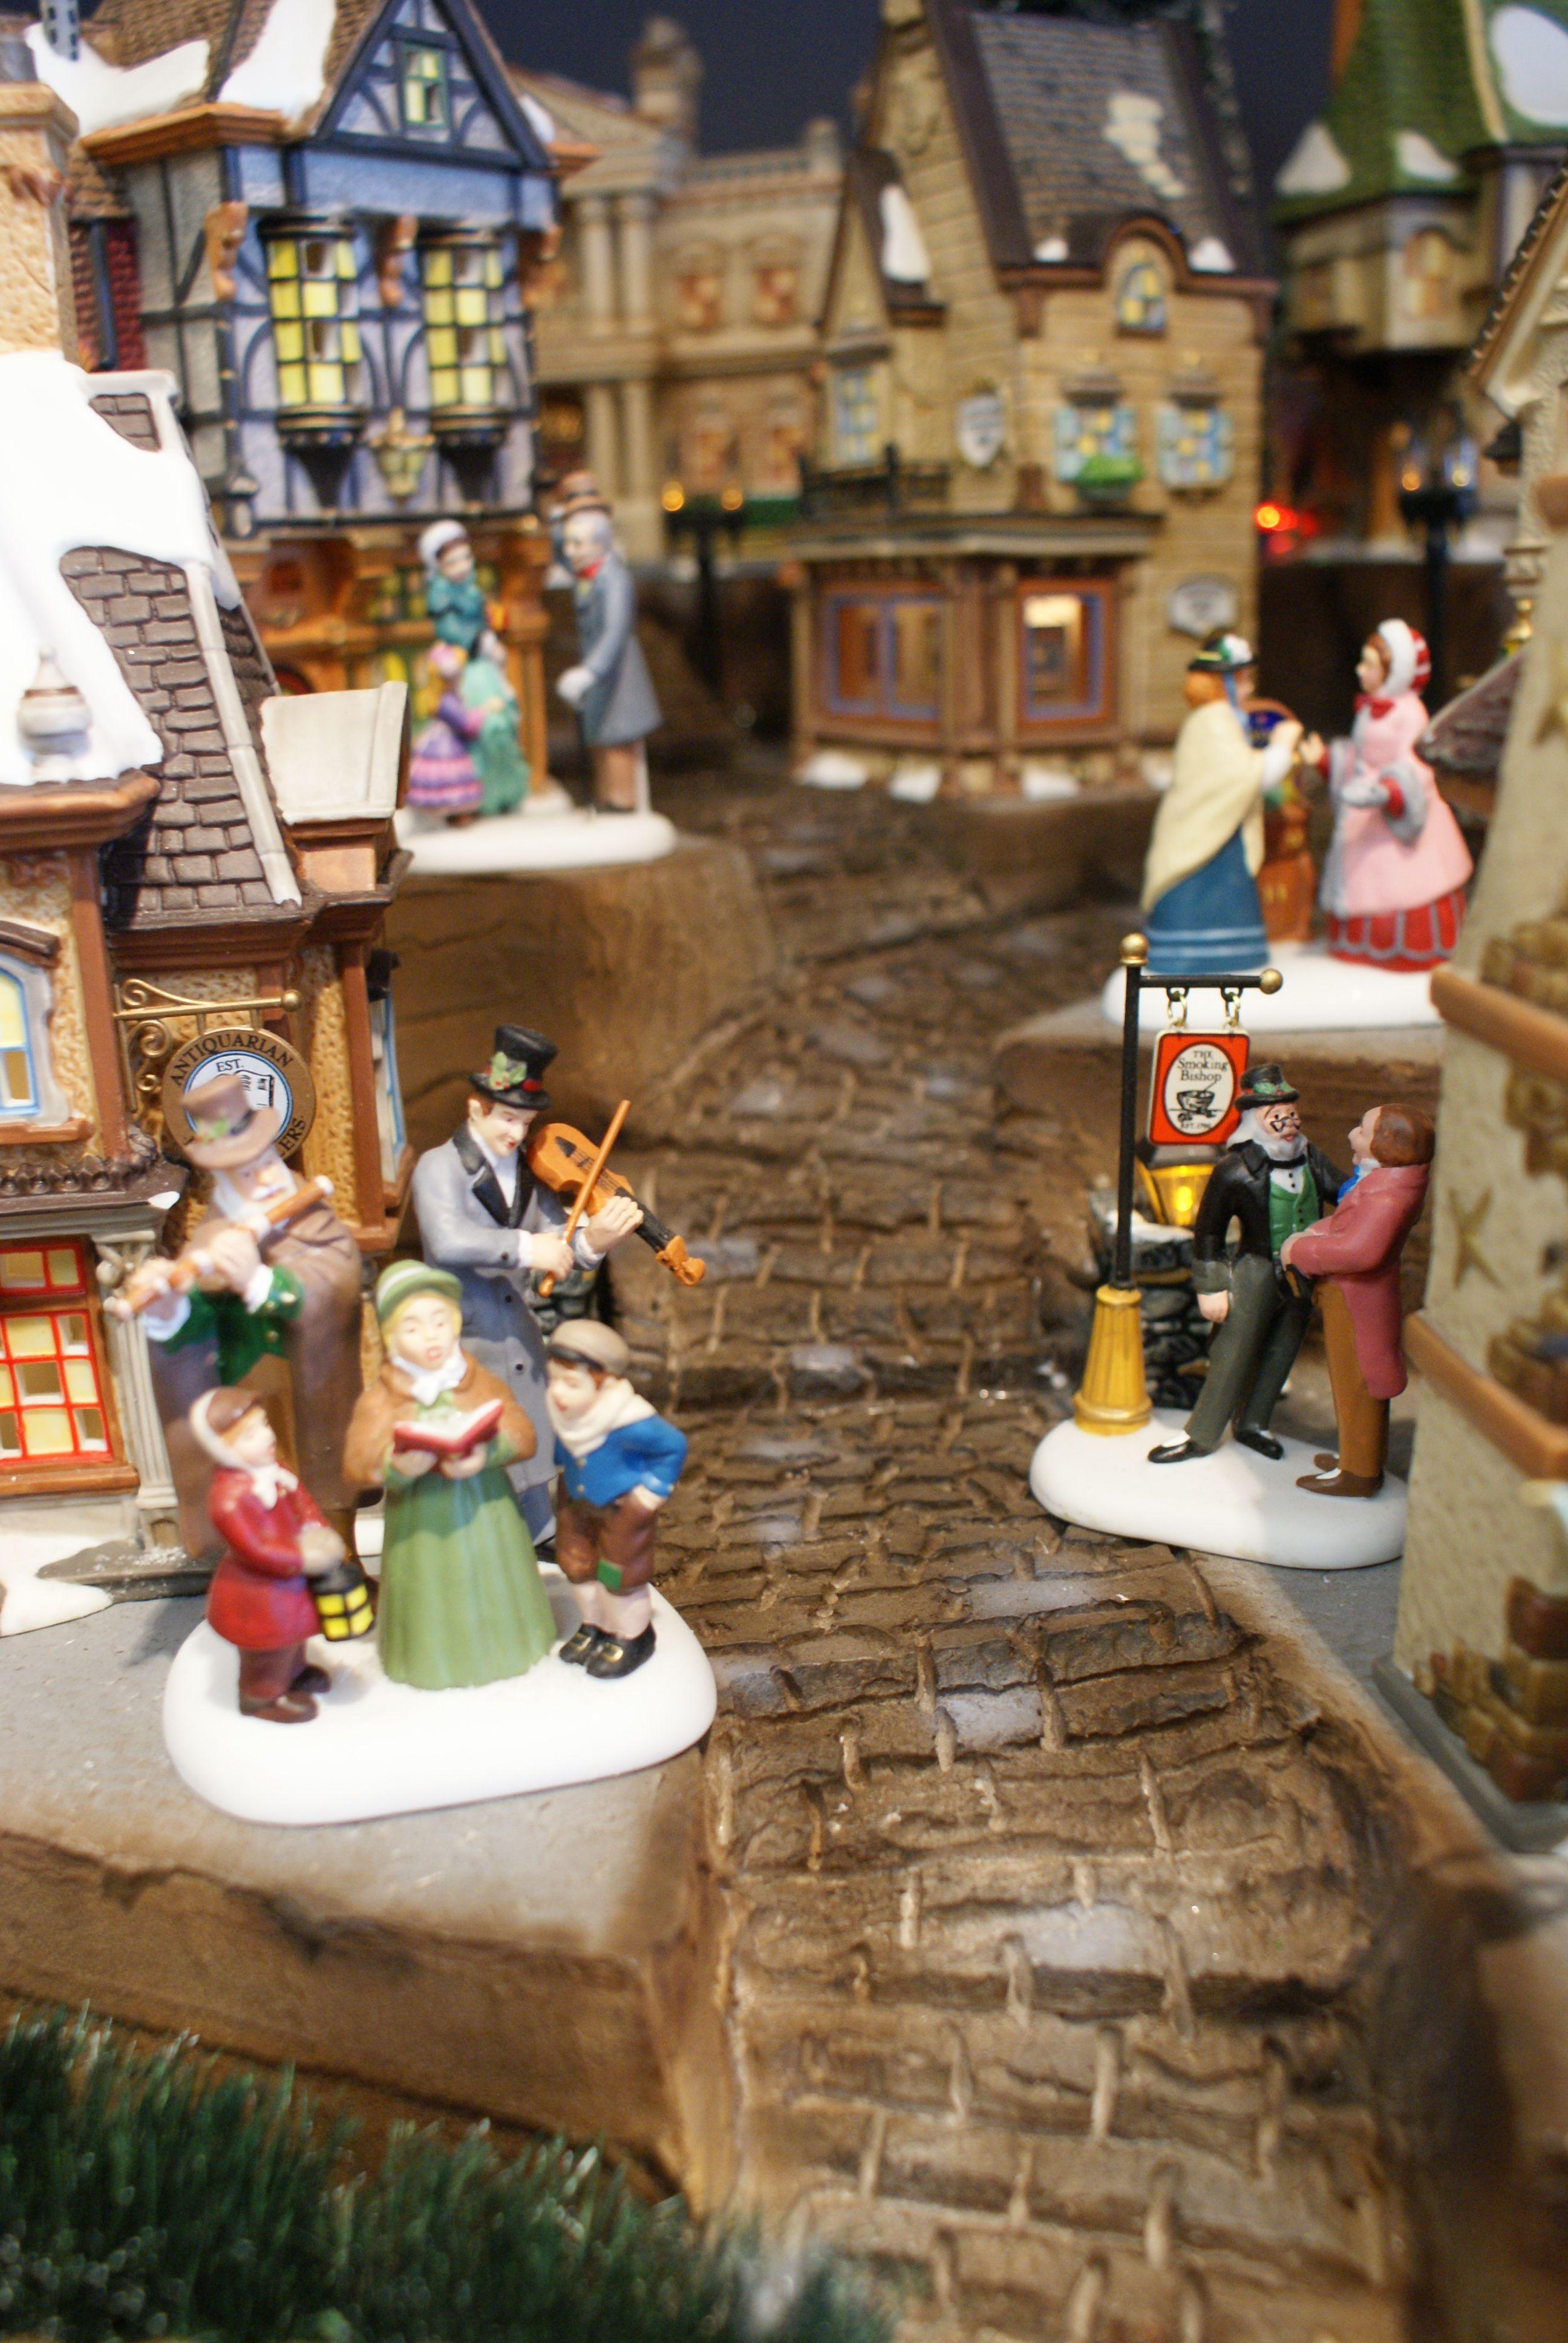 Department 56 dickens village display ideas - Sony Dsc Lemax Christmaschristmas Villageschristmas Craftschristmas Ideasdickens Villagehalloween Villagedisplay Ideasdepartment 56sony